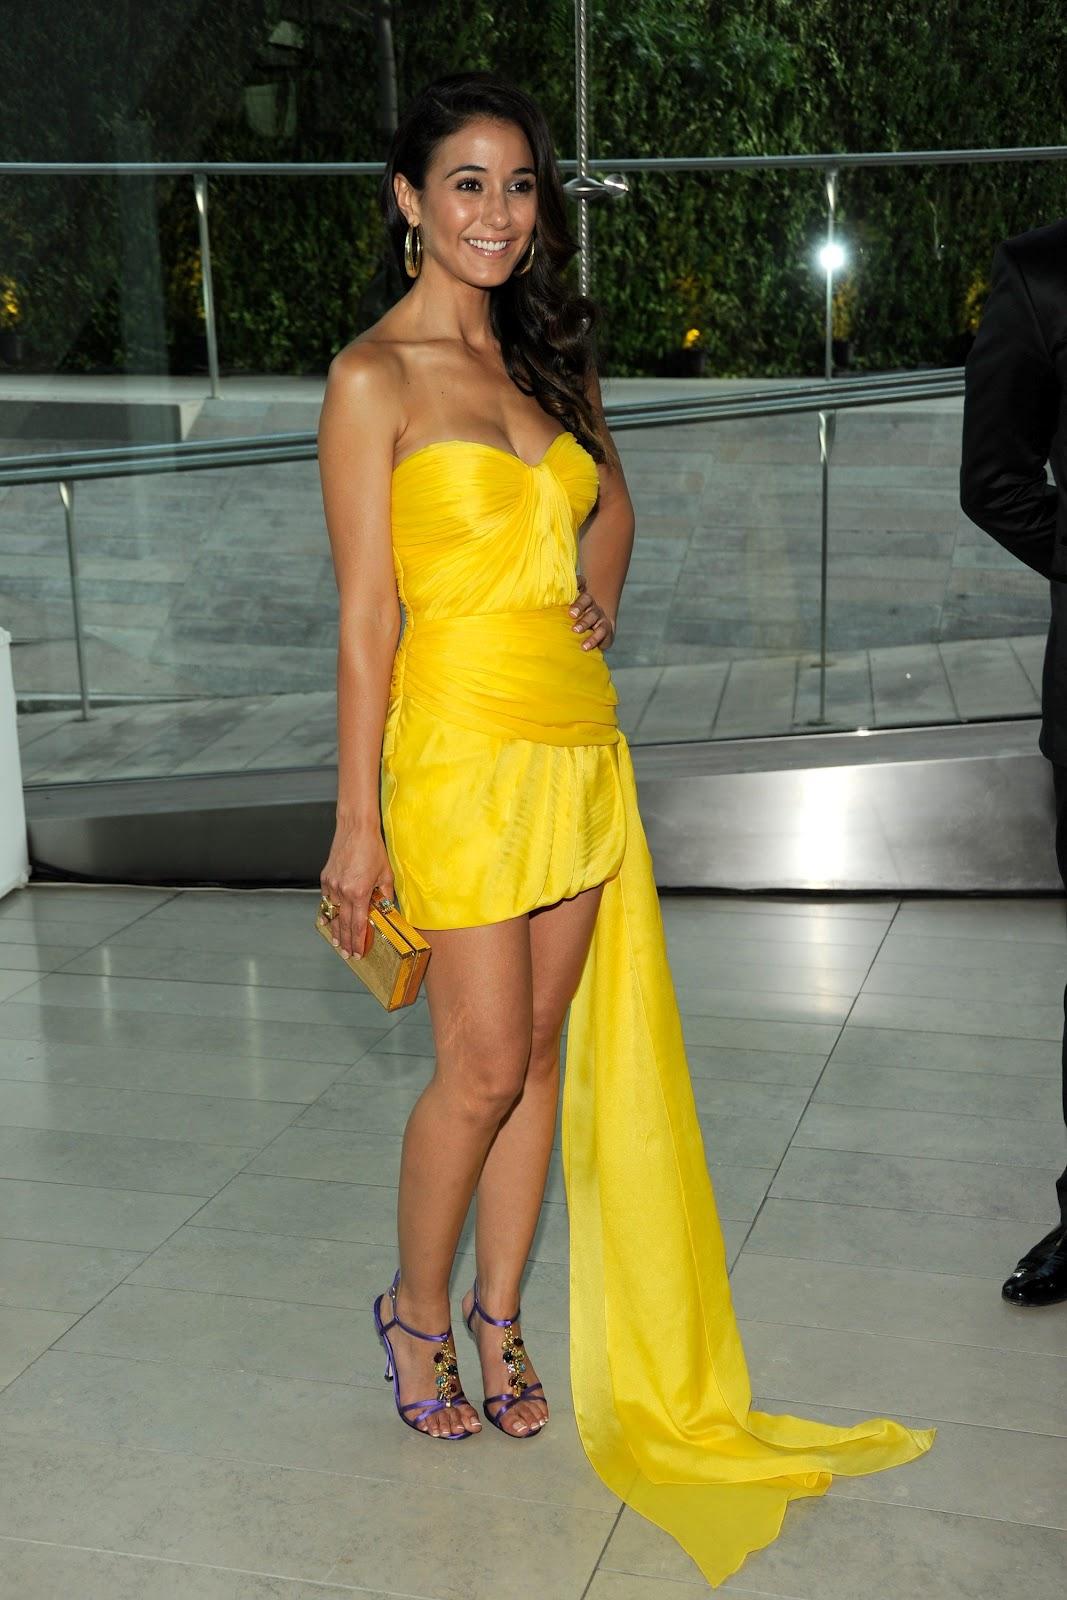 Emmanuelle Chriqui 2011 Cfda Fashion Awards In Nyc (06062011)